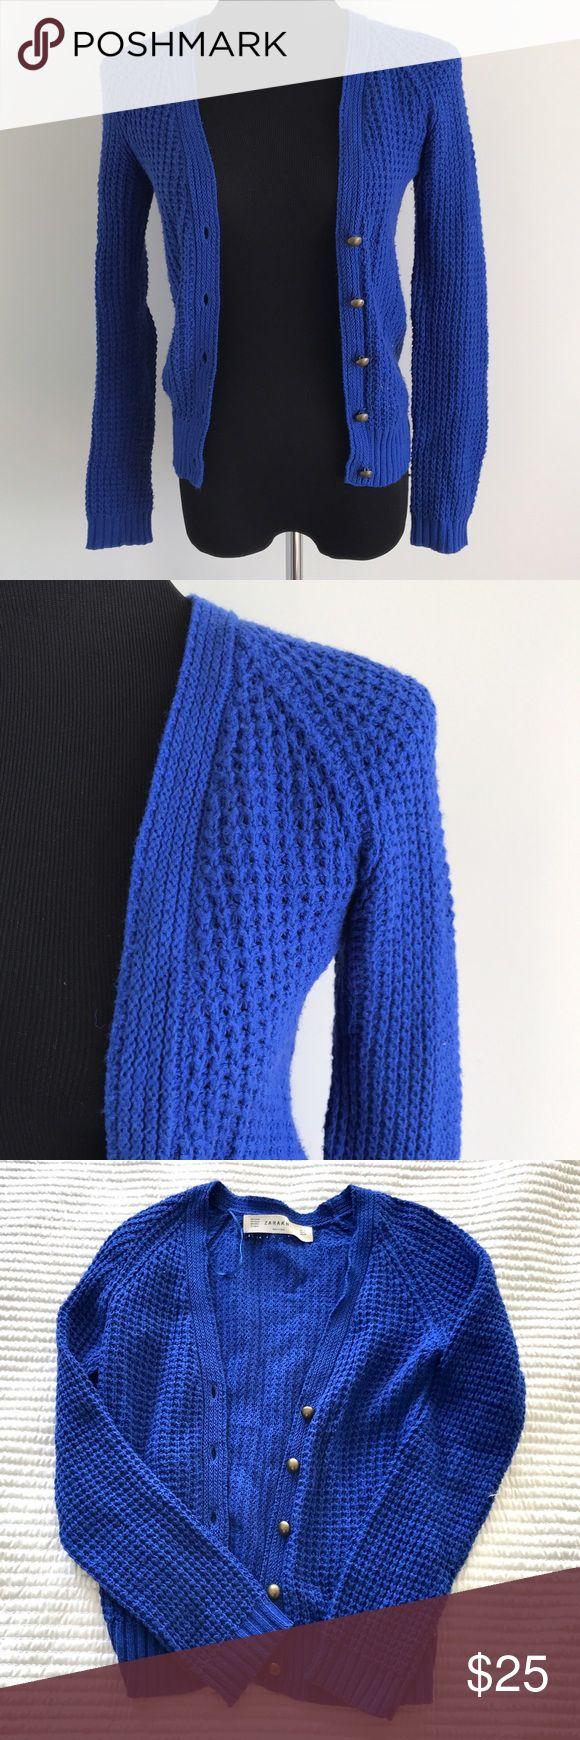 Zara royal blue knit cardigan Perfect blue warm cardigan with metal buttons // no damage no pulls Zara Sweaters Cardigans